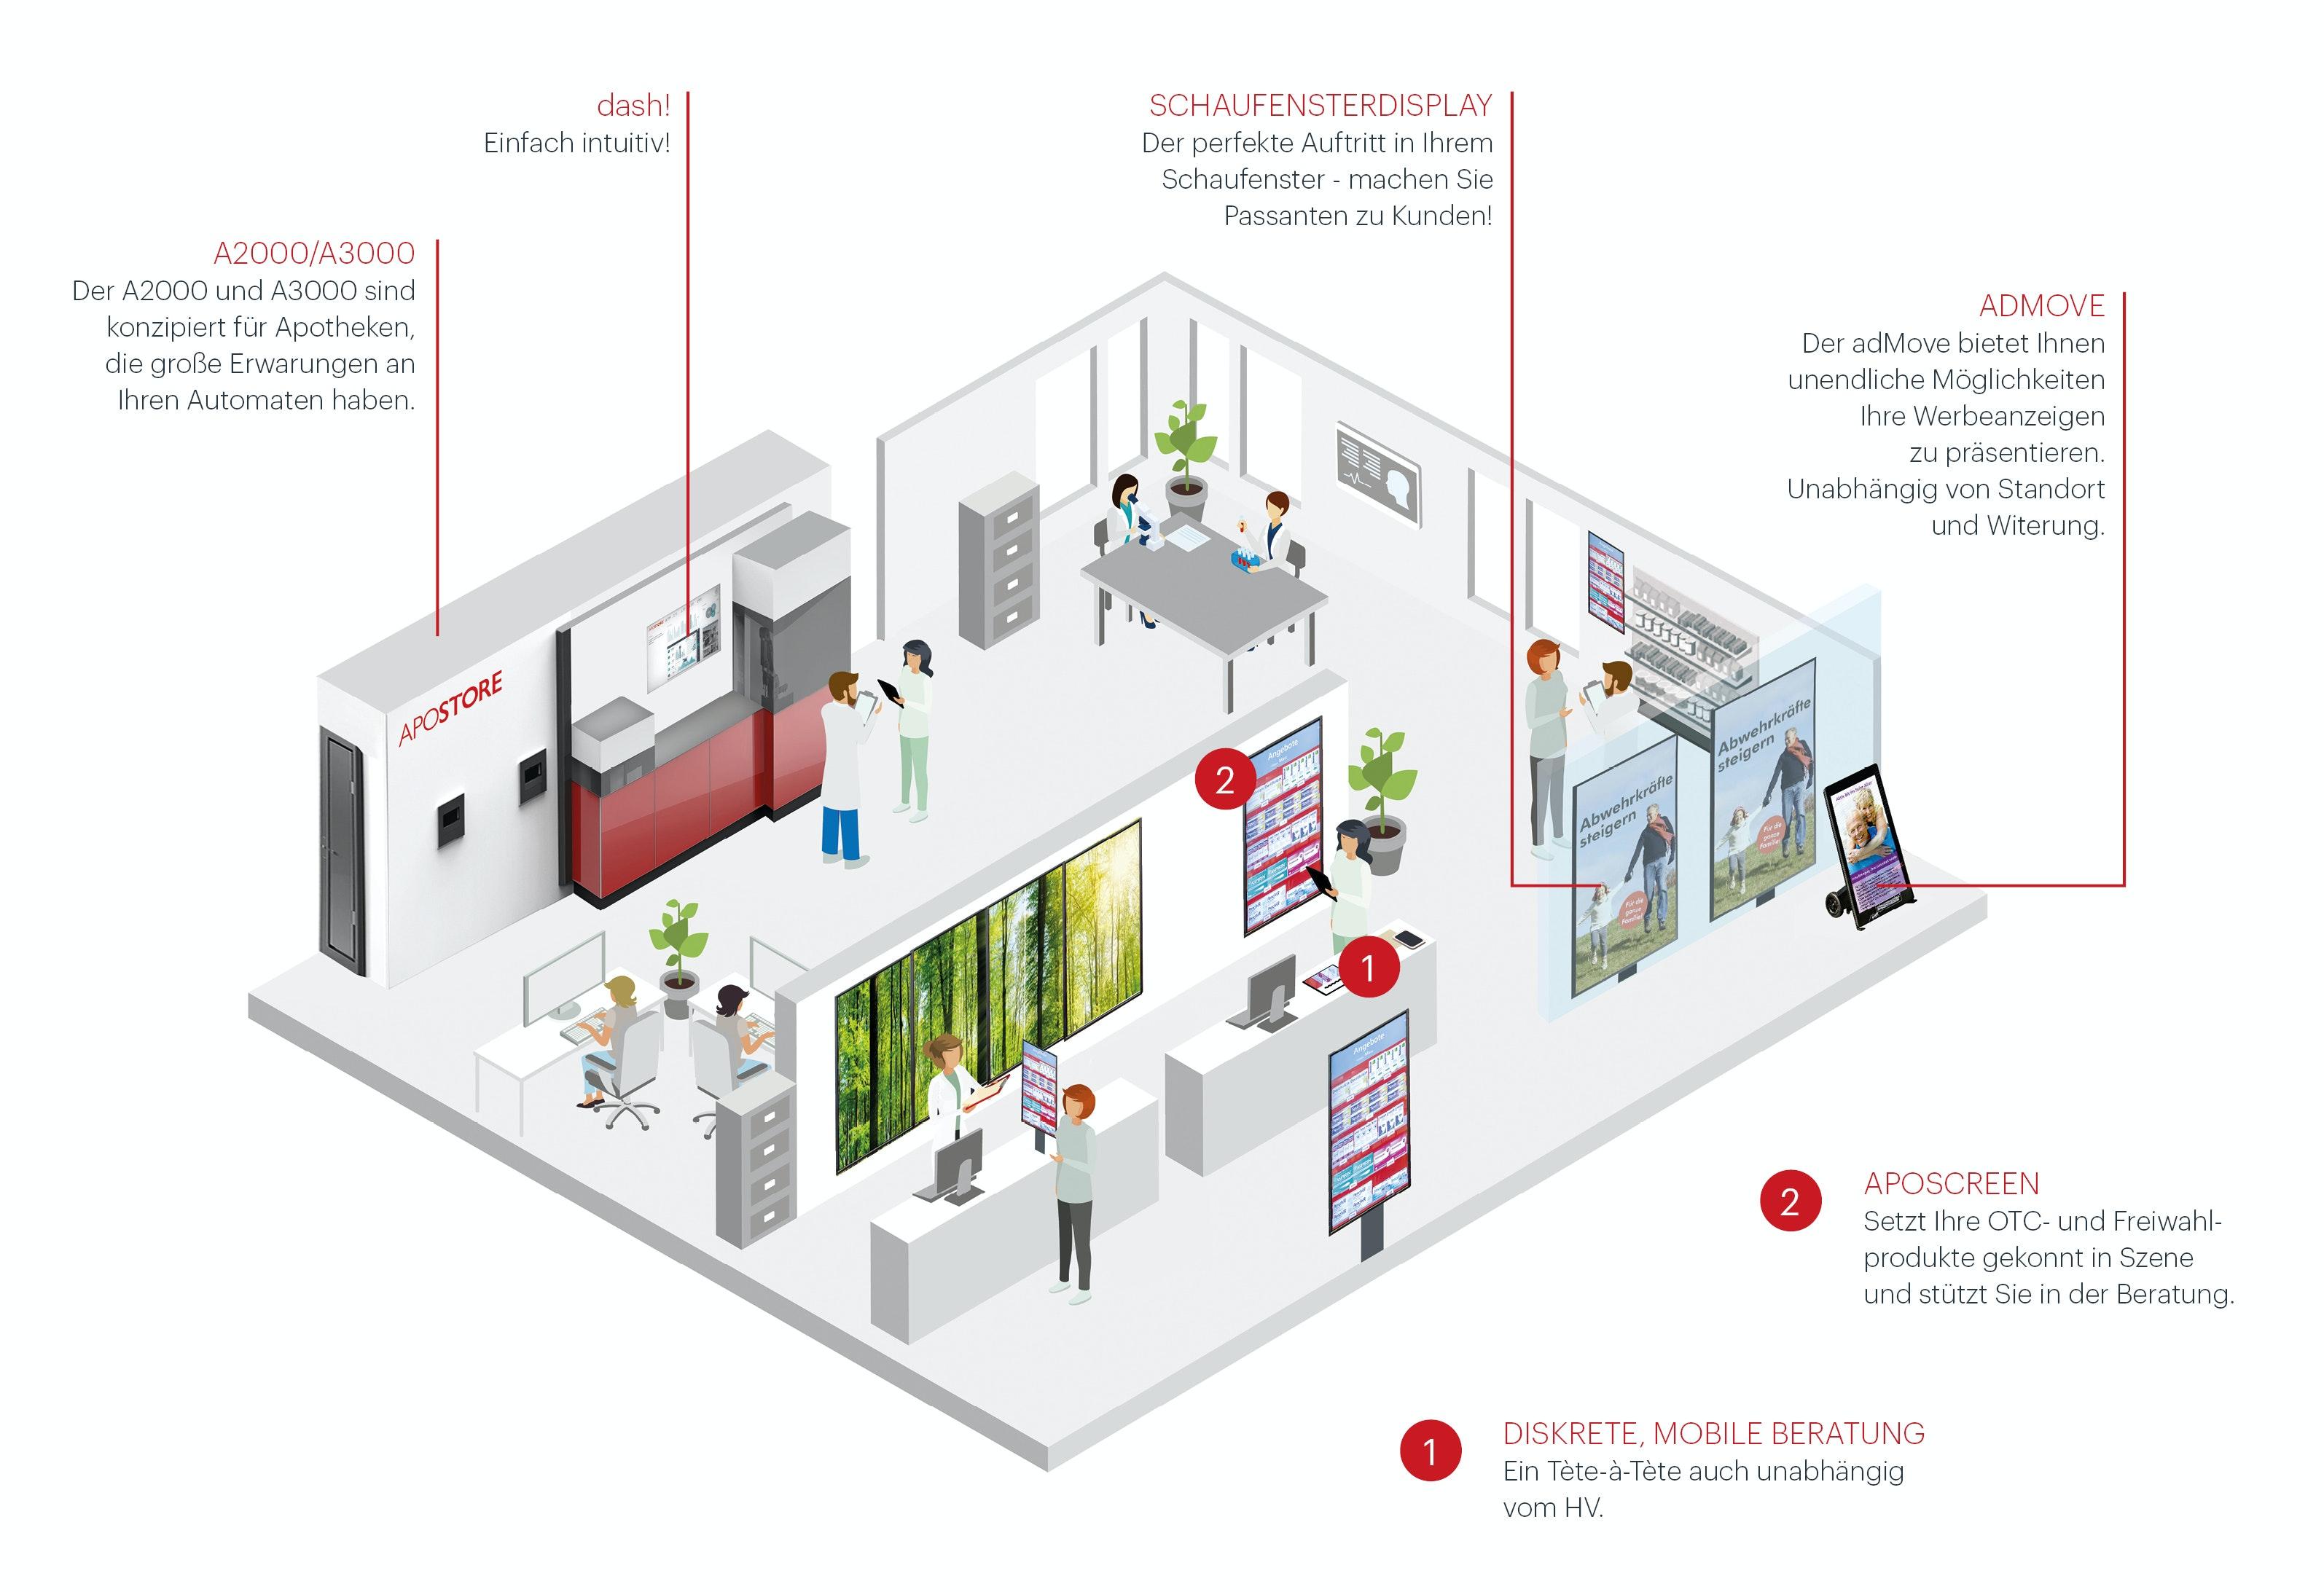 2018 Apostore Illustration Touchpoints Digitale Apotheke Automation 2